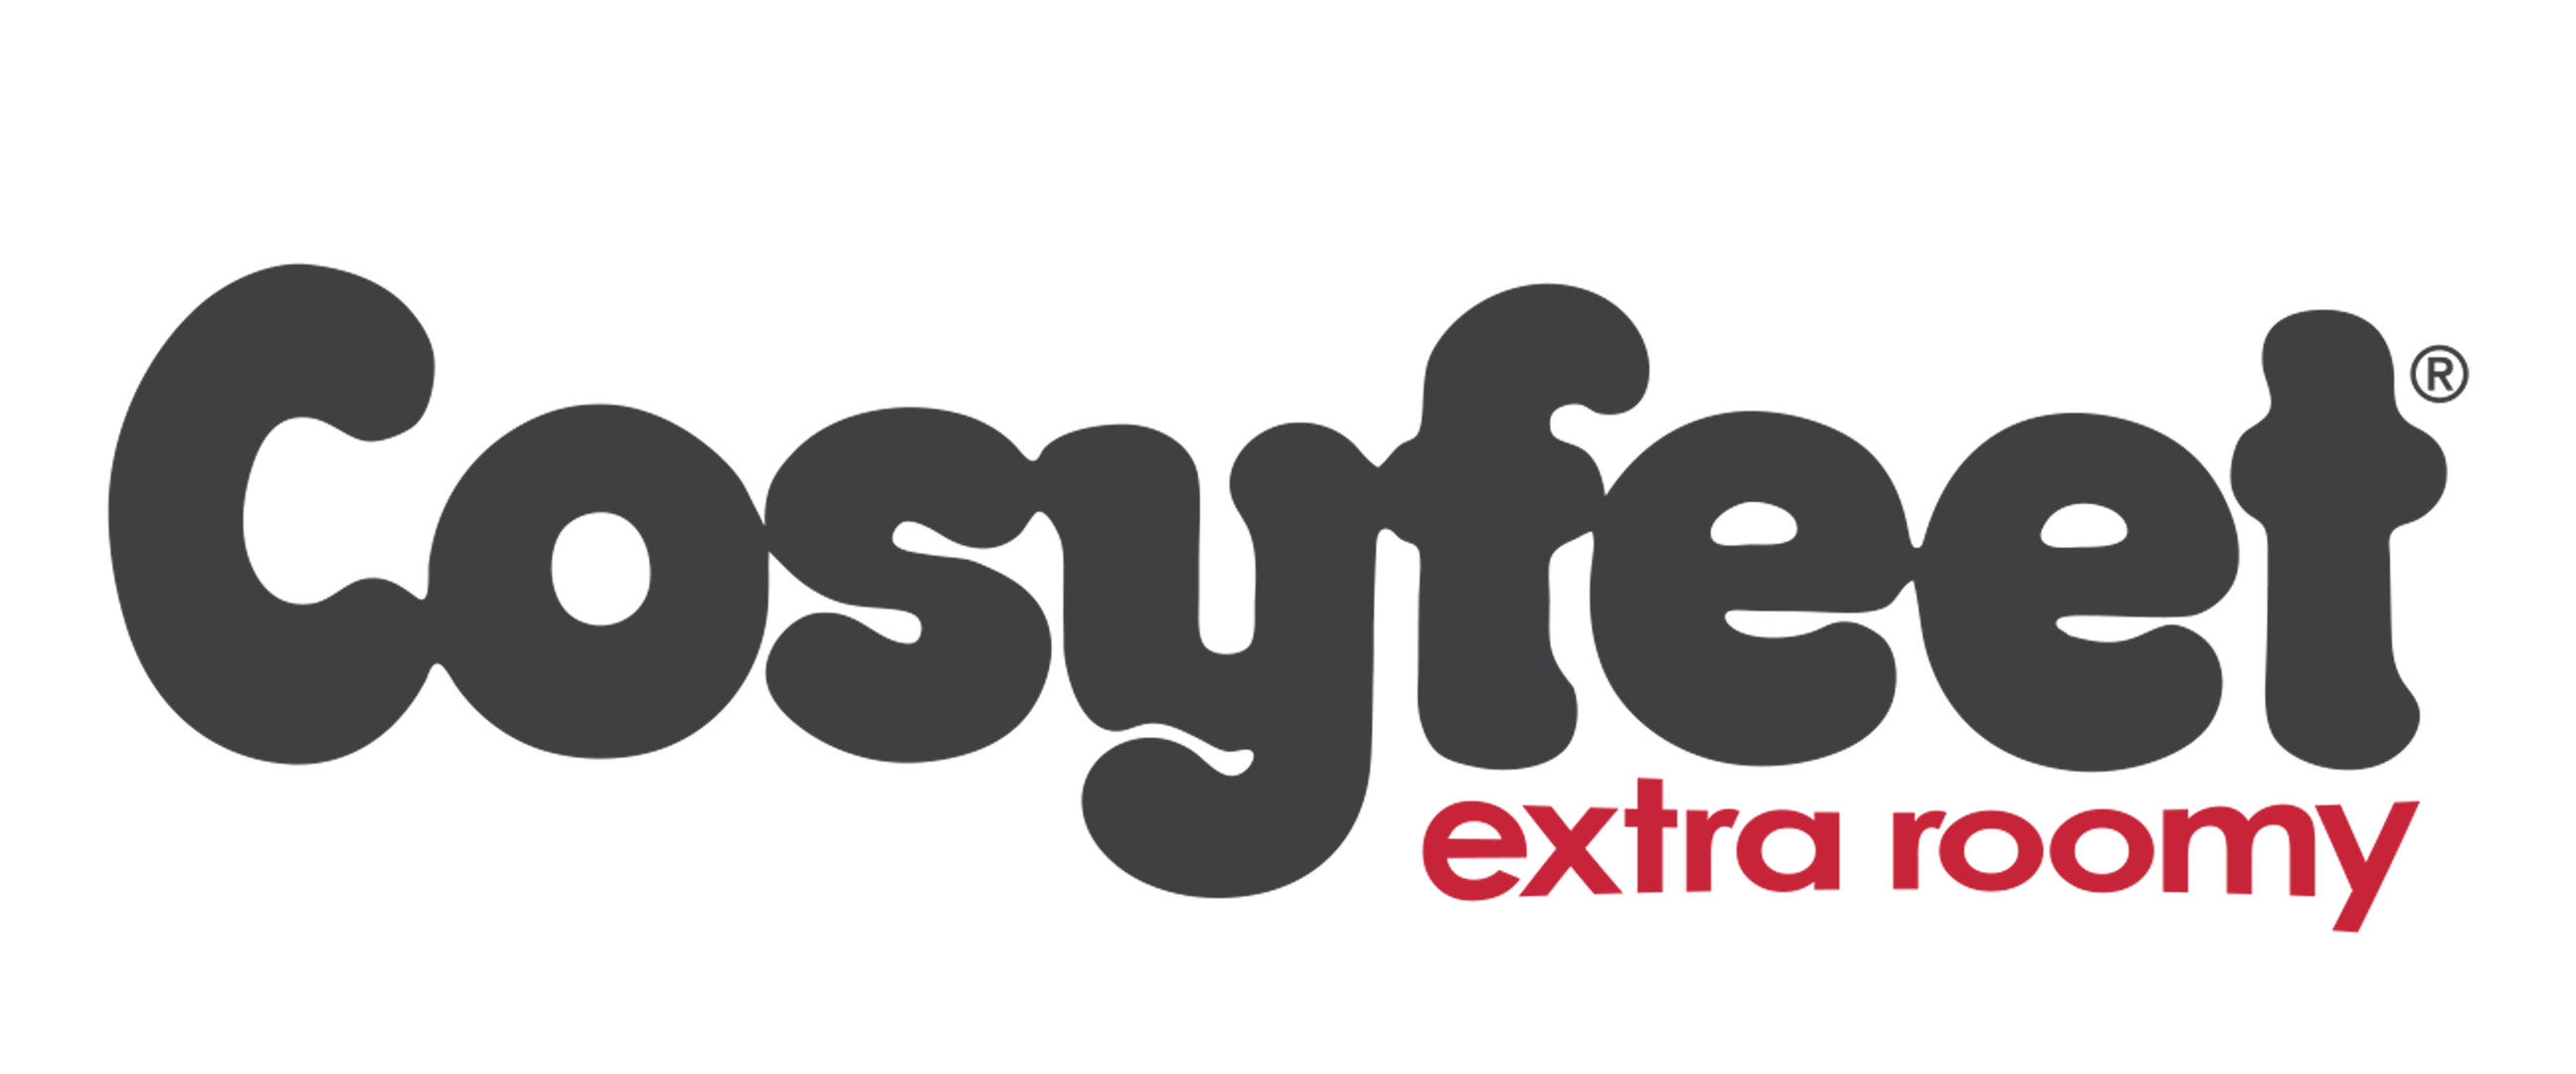 Cosyfeet_Logo_Grey_large.jpg